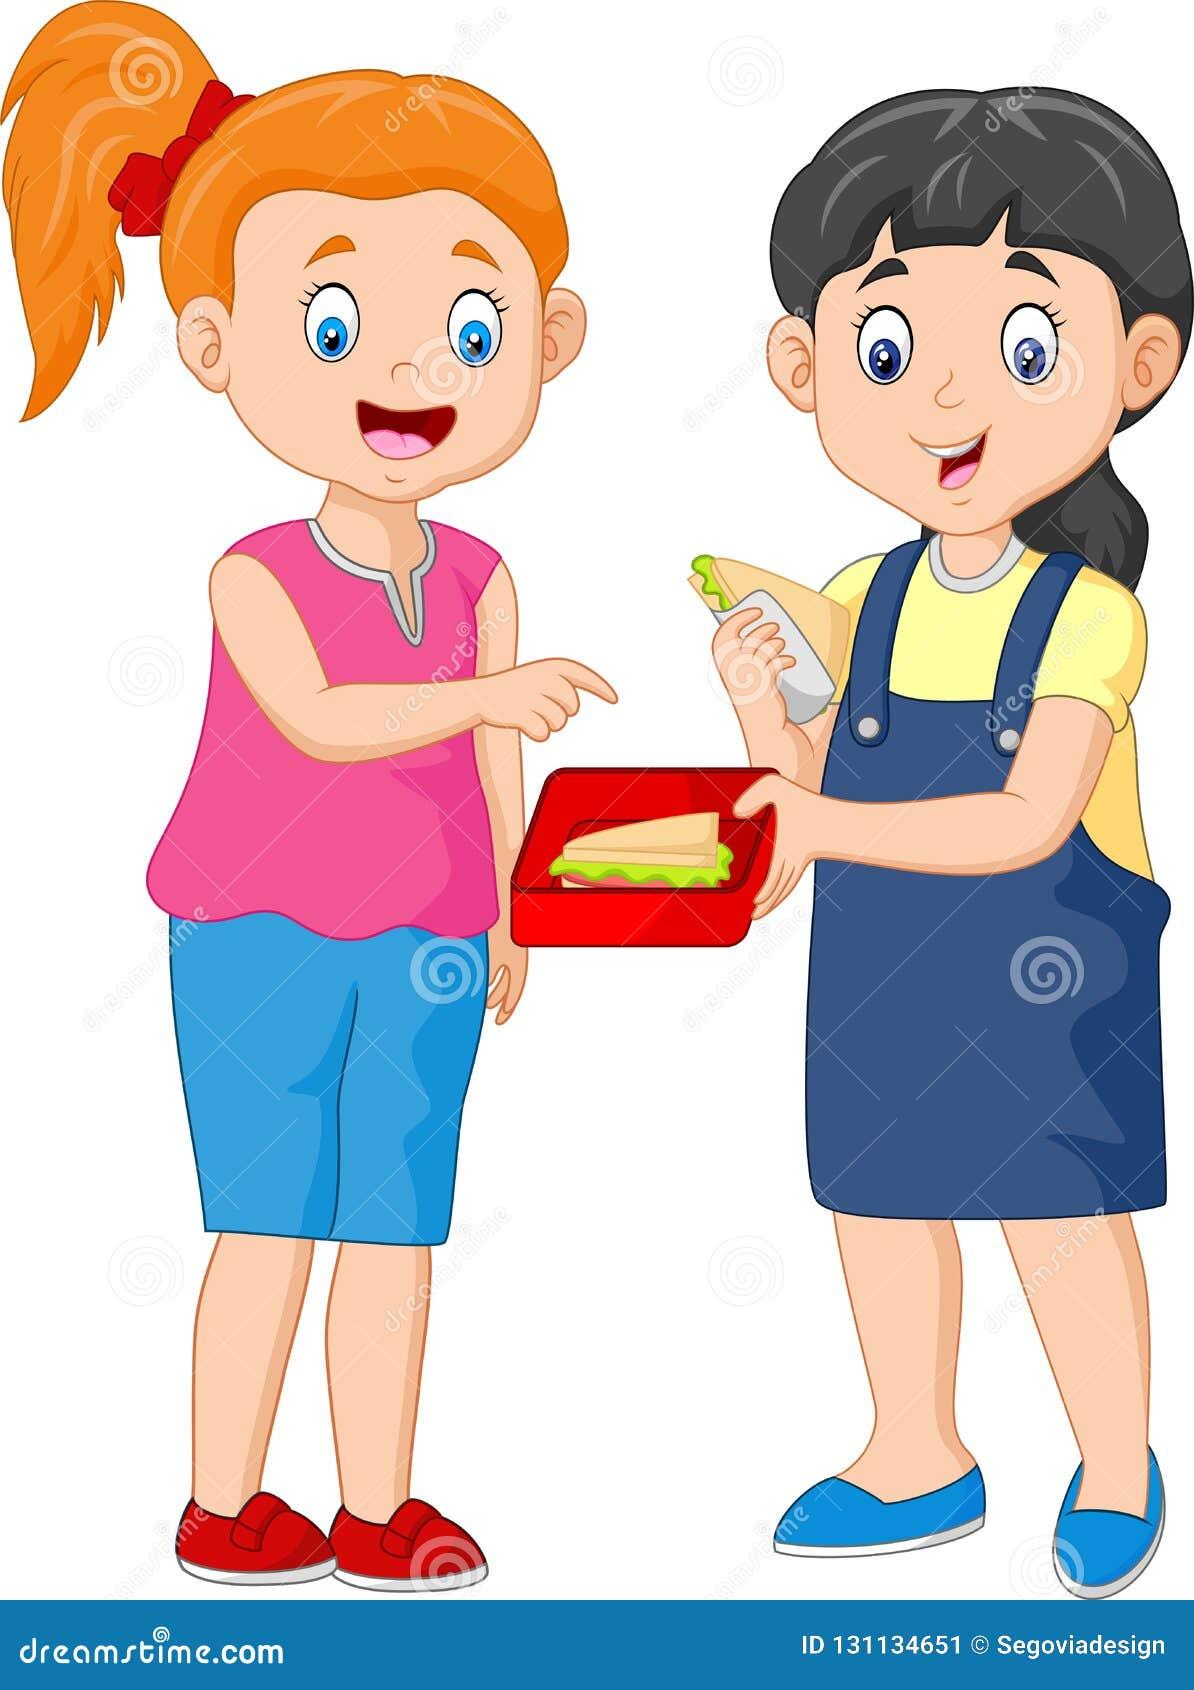 Cute Girl Sharing Sandwich with a Friend